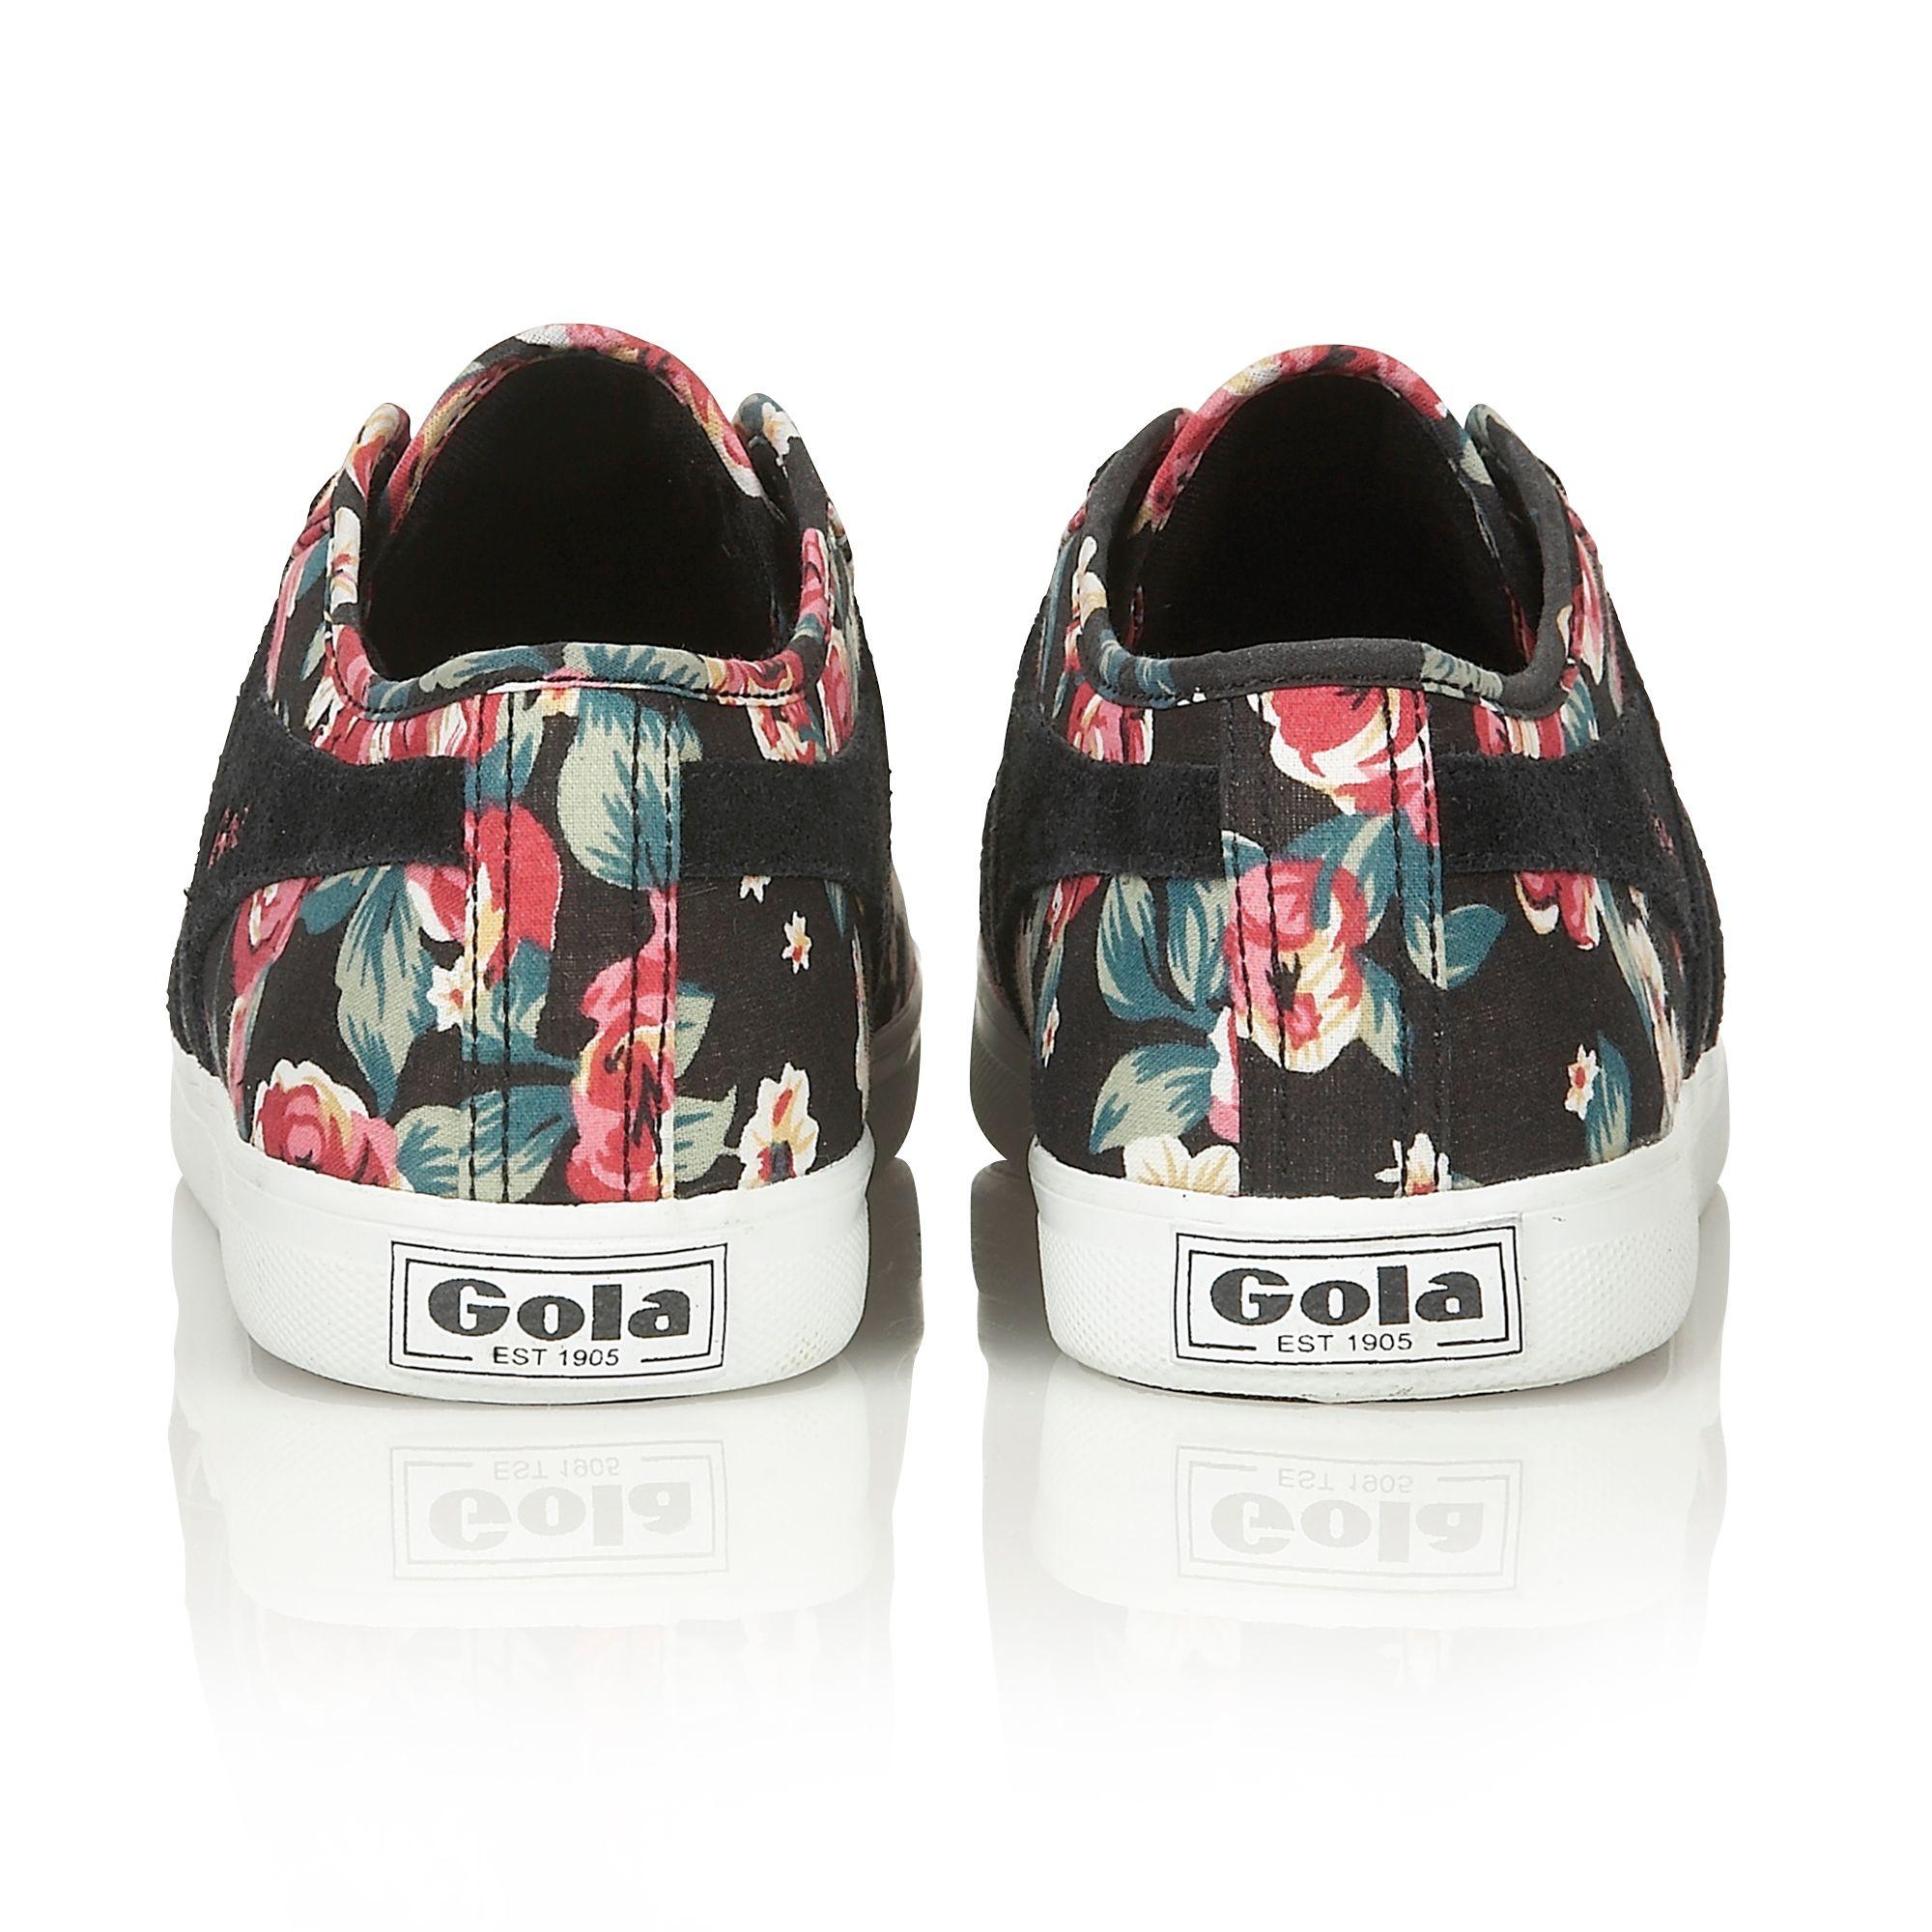 Gola Jasmine Floral Trainers in Black